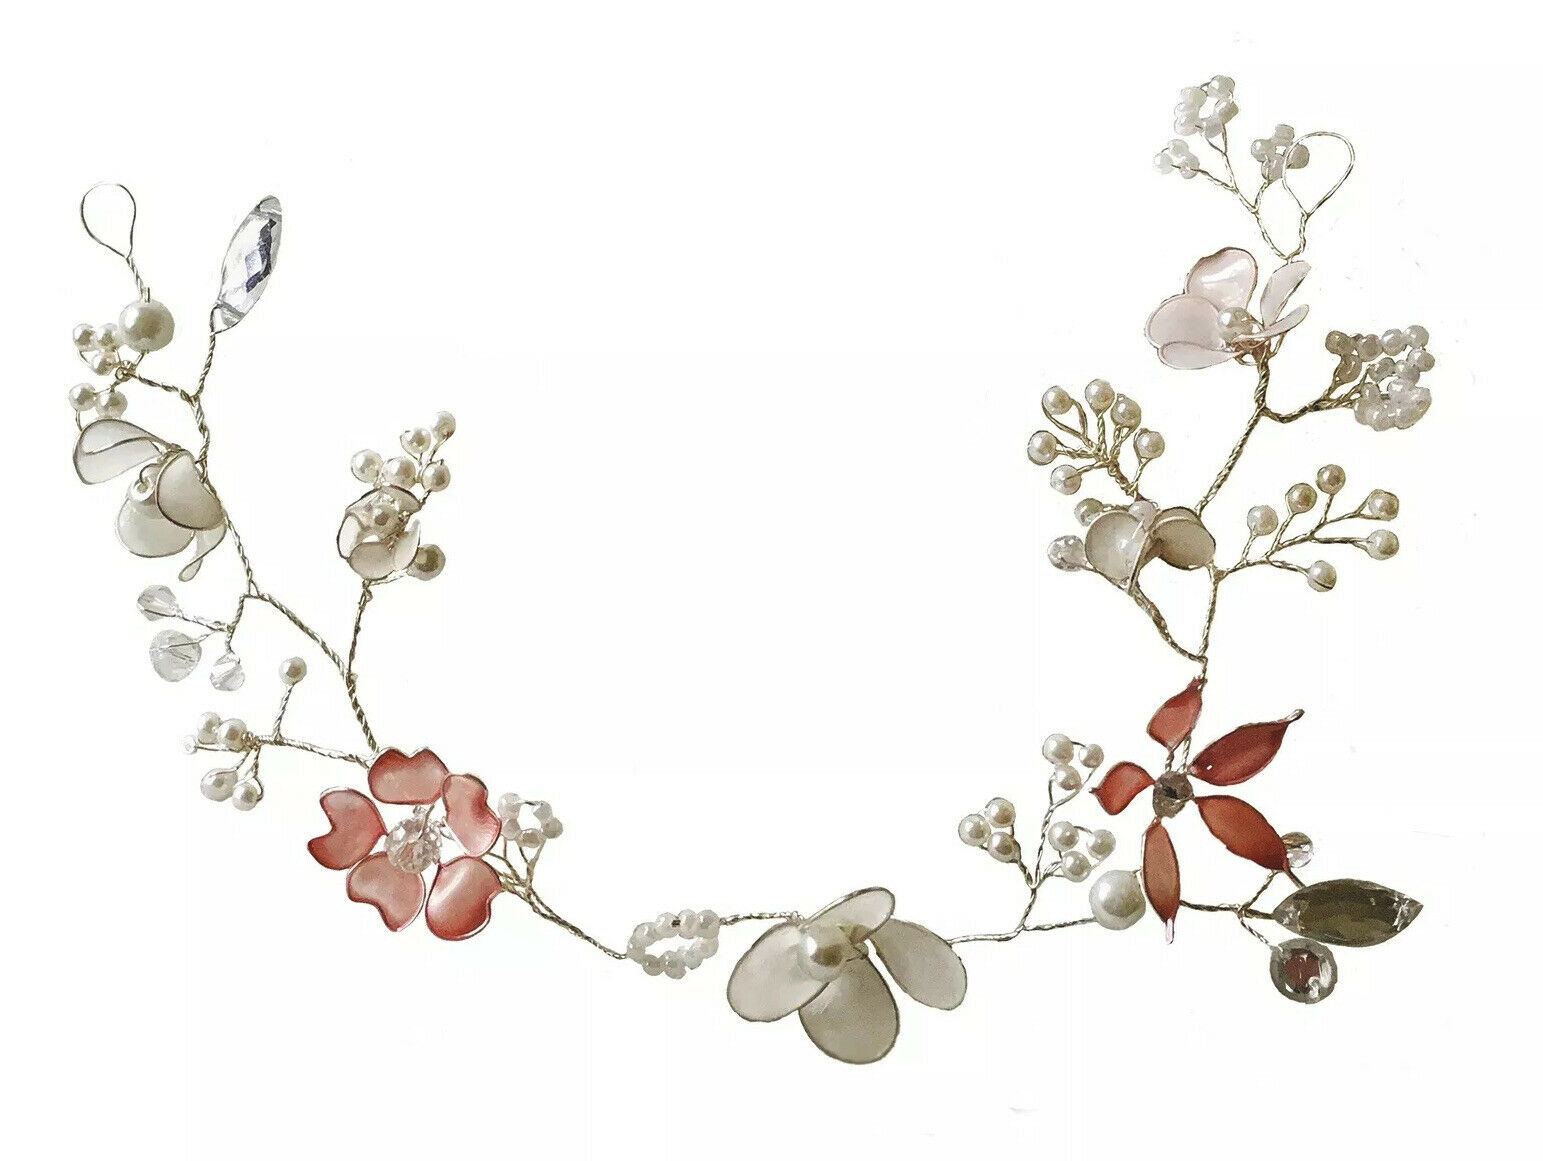 Rustic Floral Hair Vine Beaded Woodland Wedding Halo Flower Crown Boho Bride